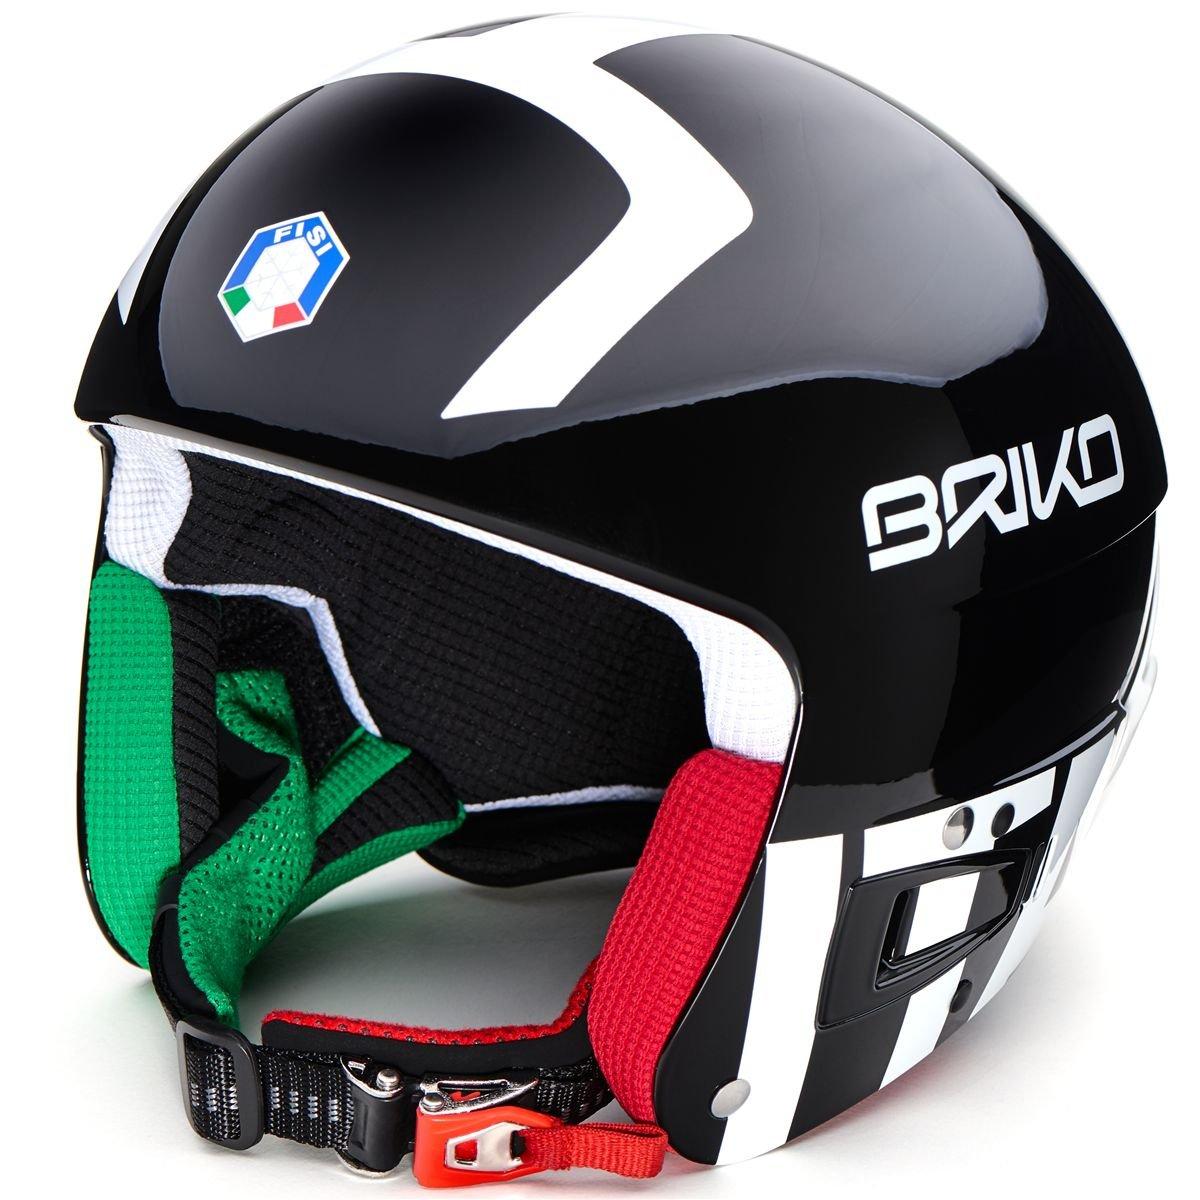 Briko Vulcano FIS 6.8 - FISI schwarz Weiß